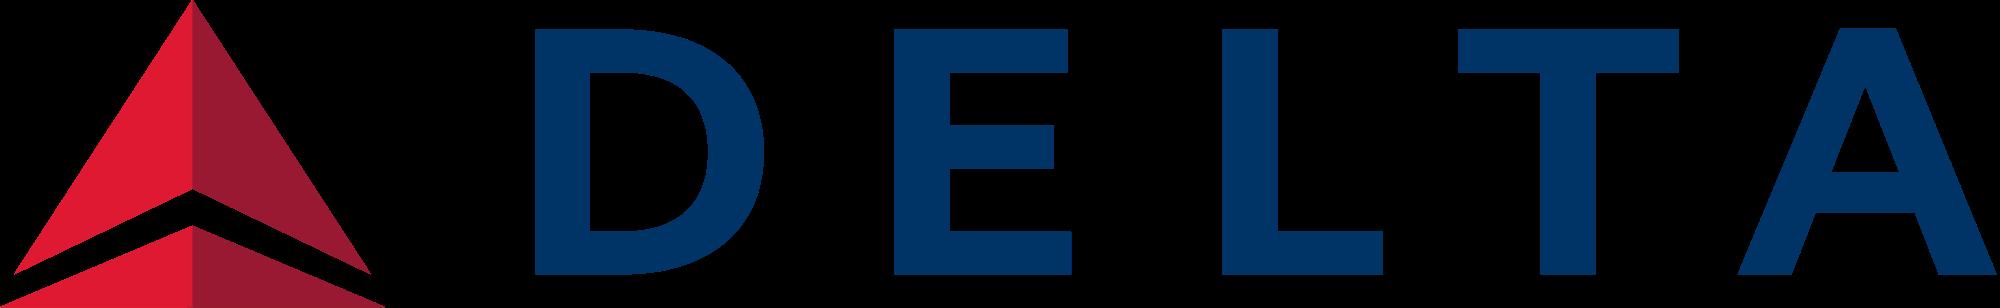 2000px-Delta_logo.png